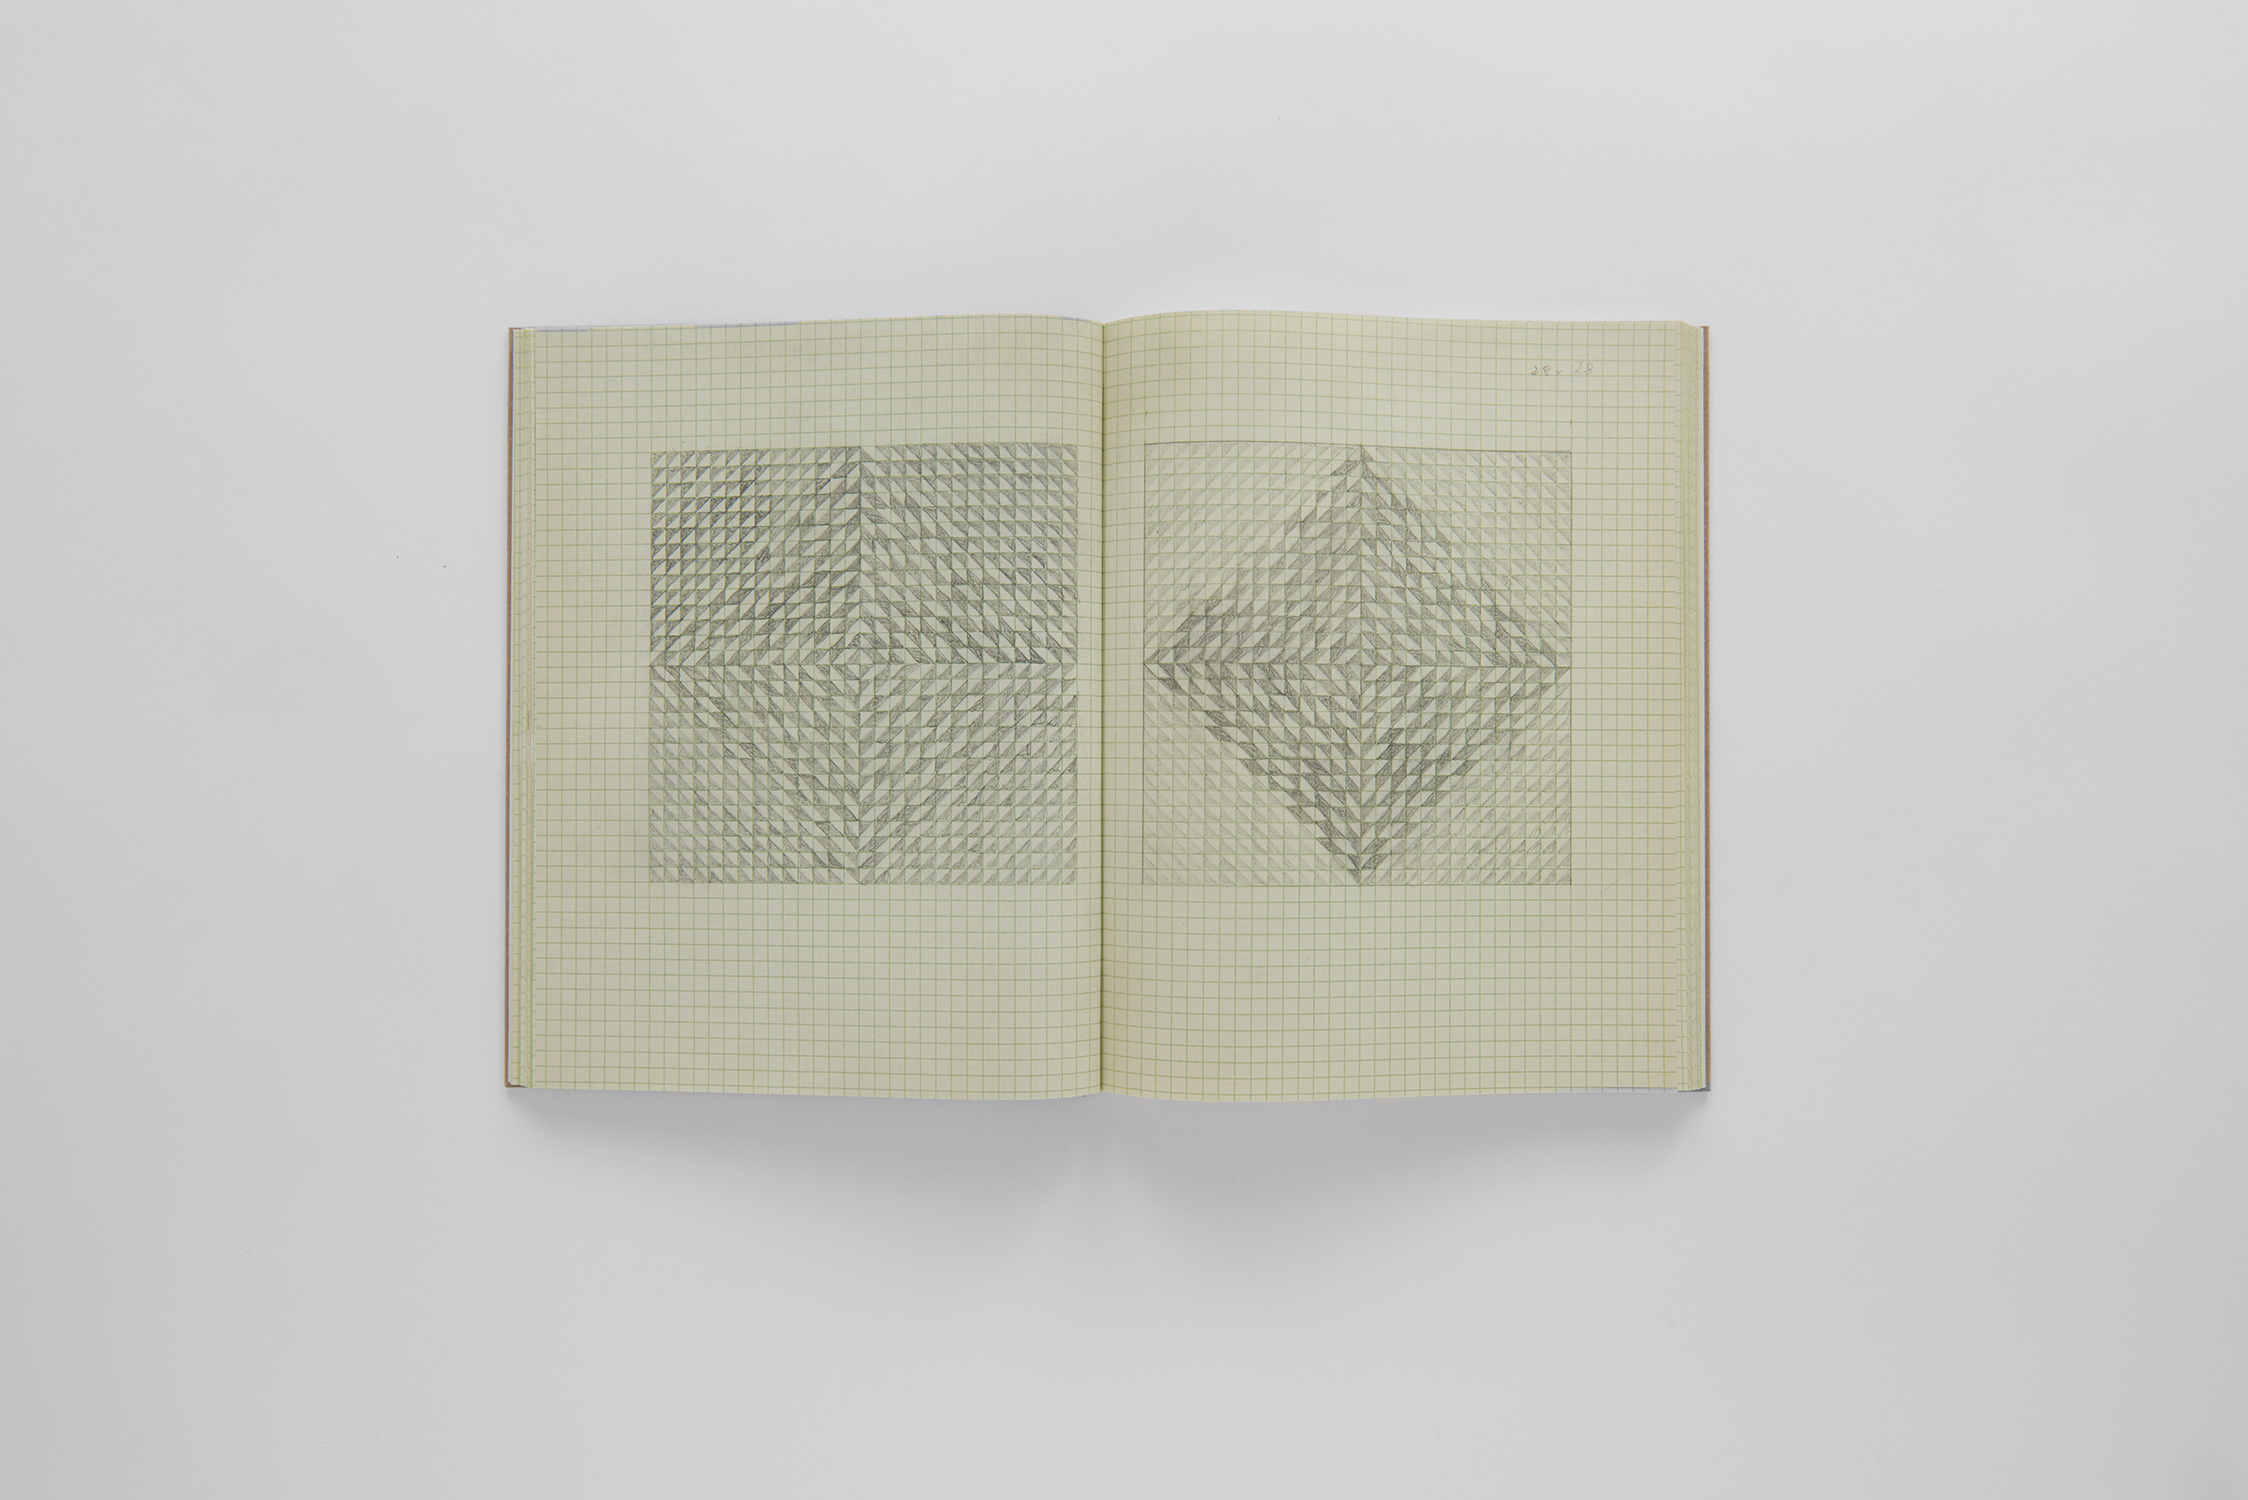 Anni Albers Notebooks, David Zwirner Books